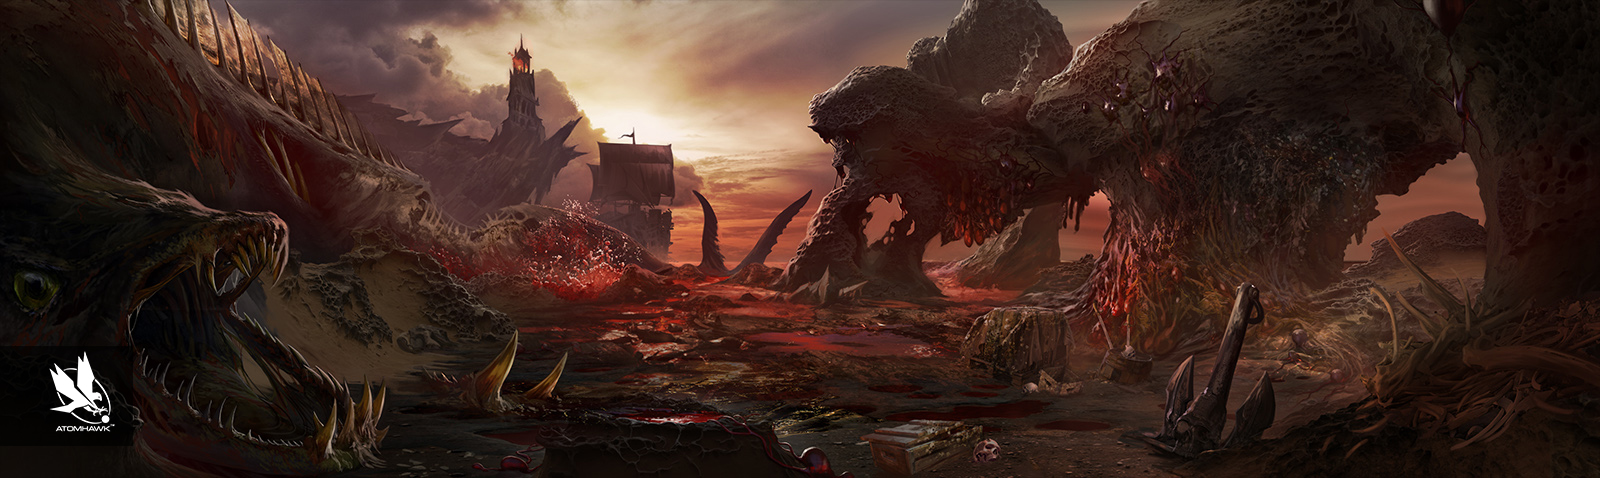 Atomhawk_Warner-Bros-NetherRealm_Mortal-Kombat-11_Concept-Art_Environment-Design_Sea-of-Blood.jpg